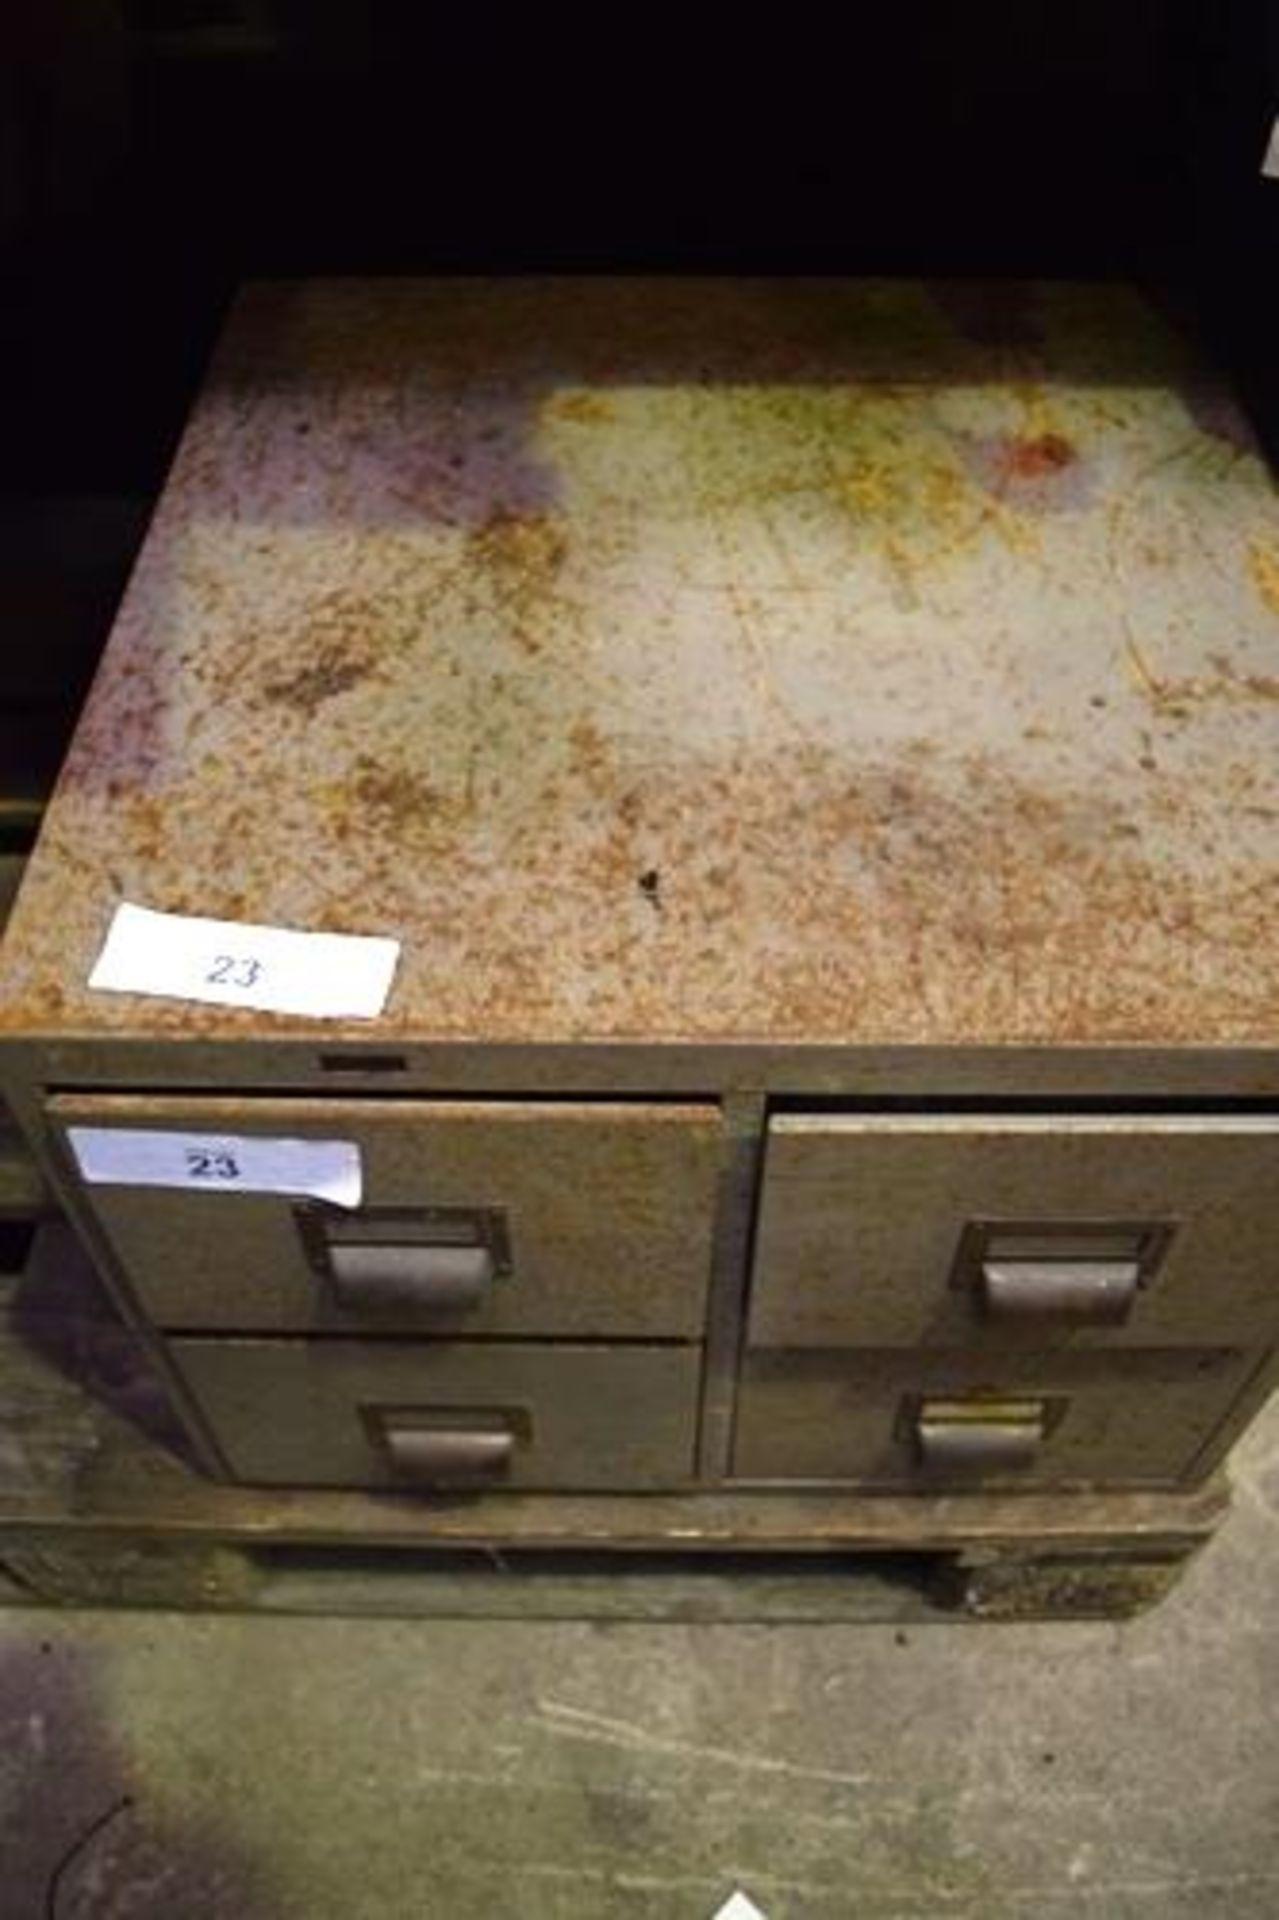 Lot 23 - Grey steel 4 drawer filing system, 50cm(W) x 50cm(D) X 40cm(H) - Second-hand (GS14)